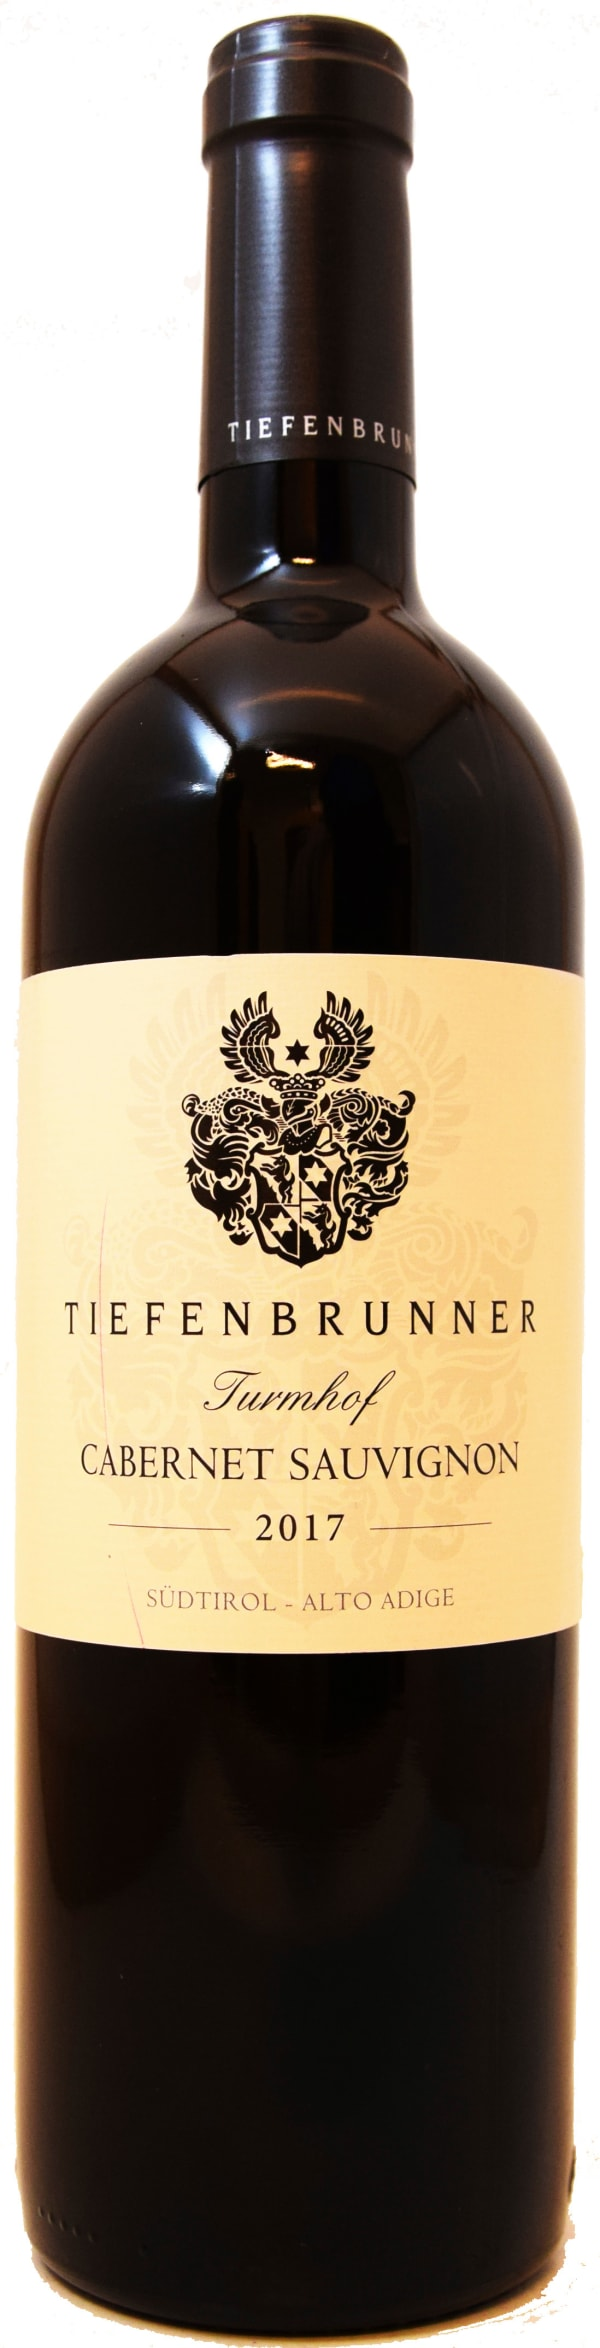 Tiefenbrunner Turmhof Cabernet Sauvignon 2017